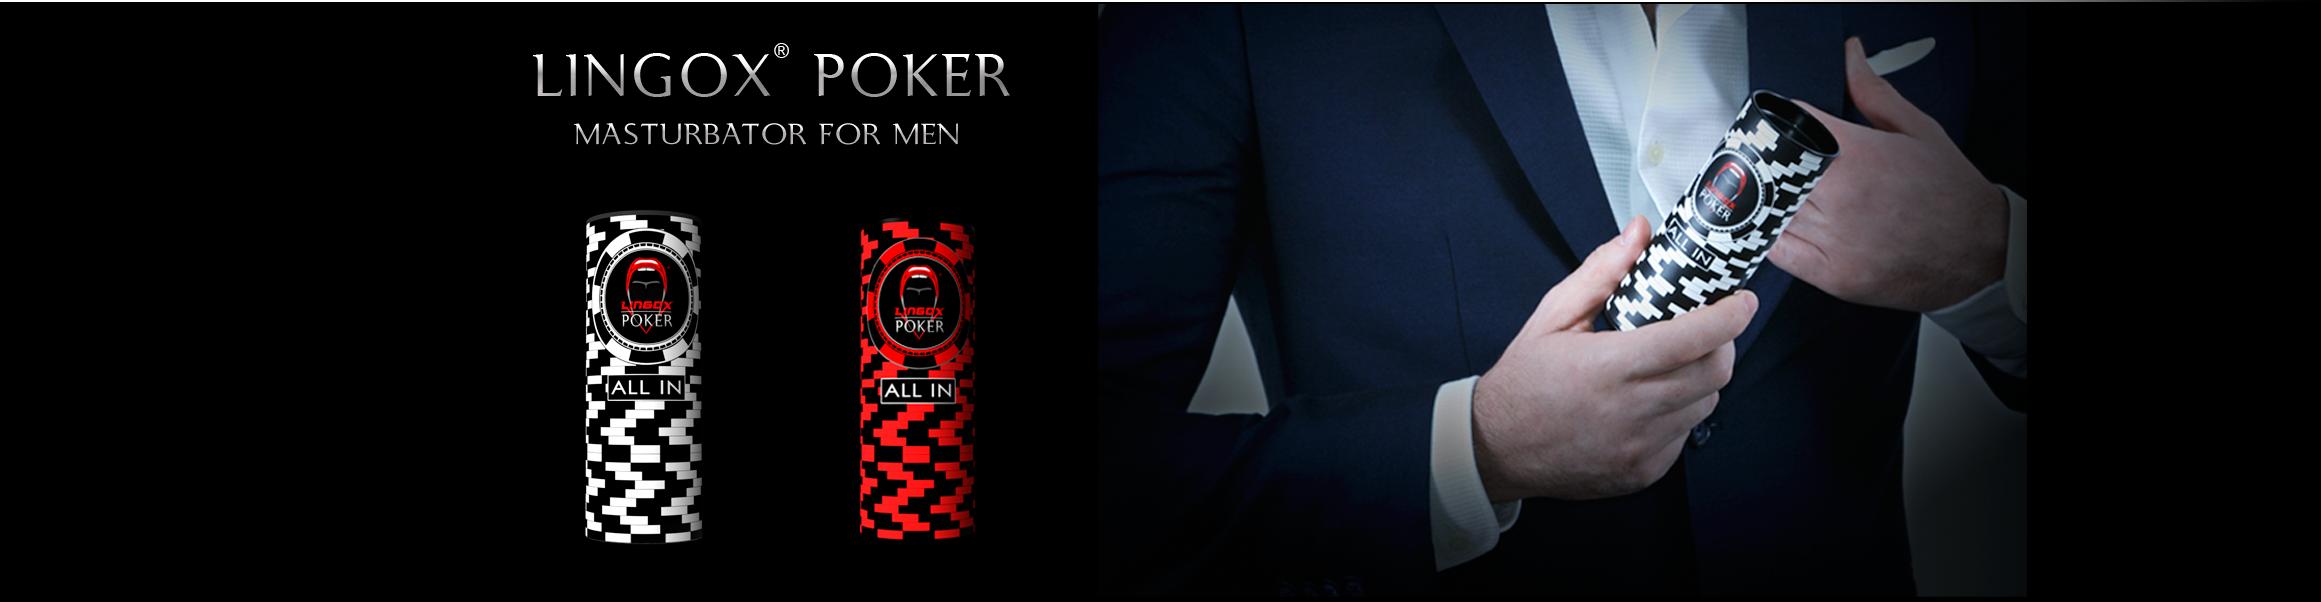 Lingox Poker Male Masturbator